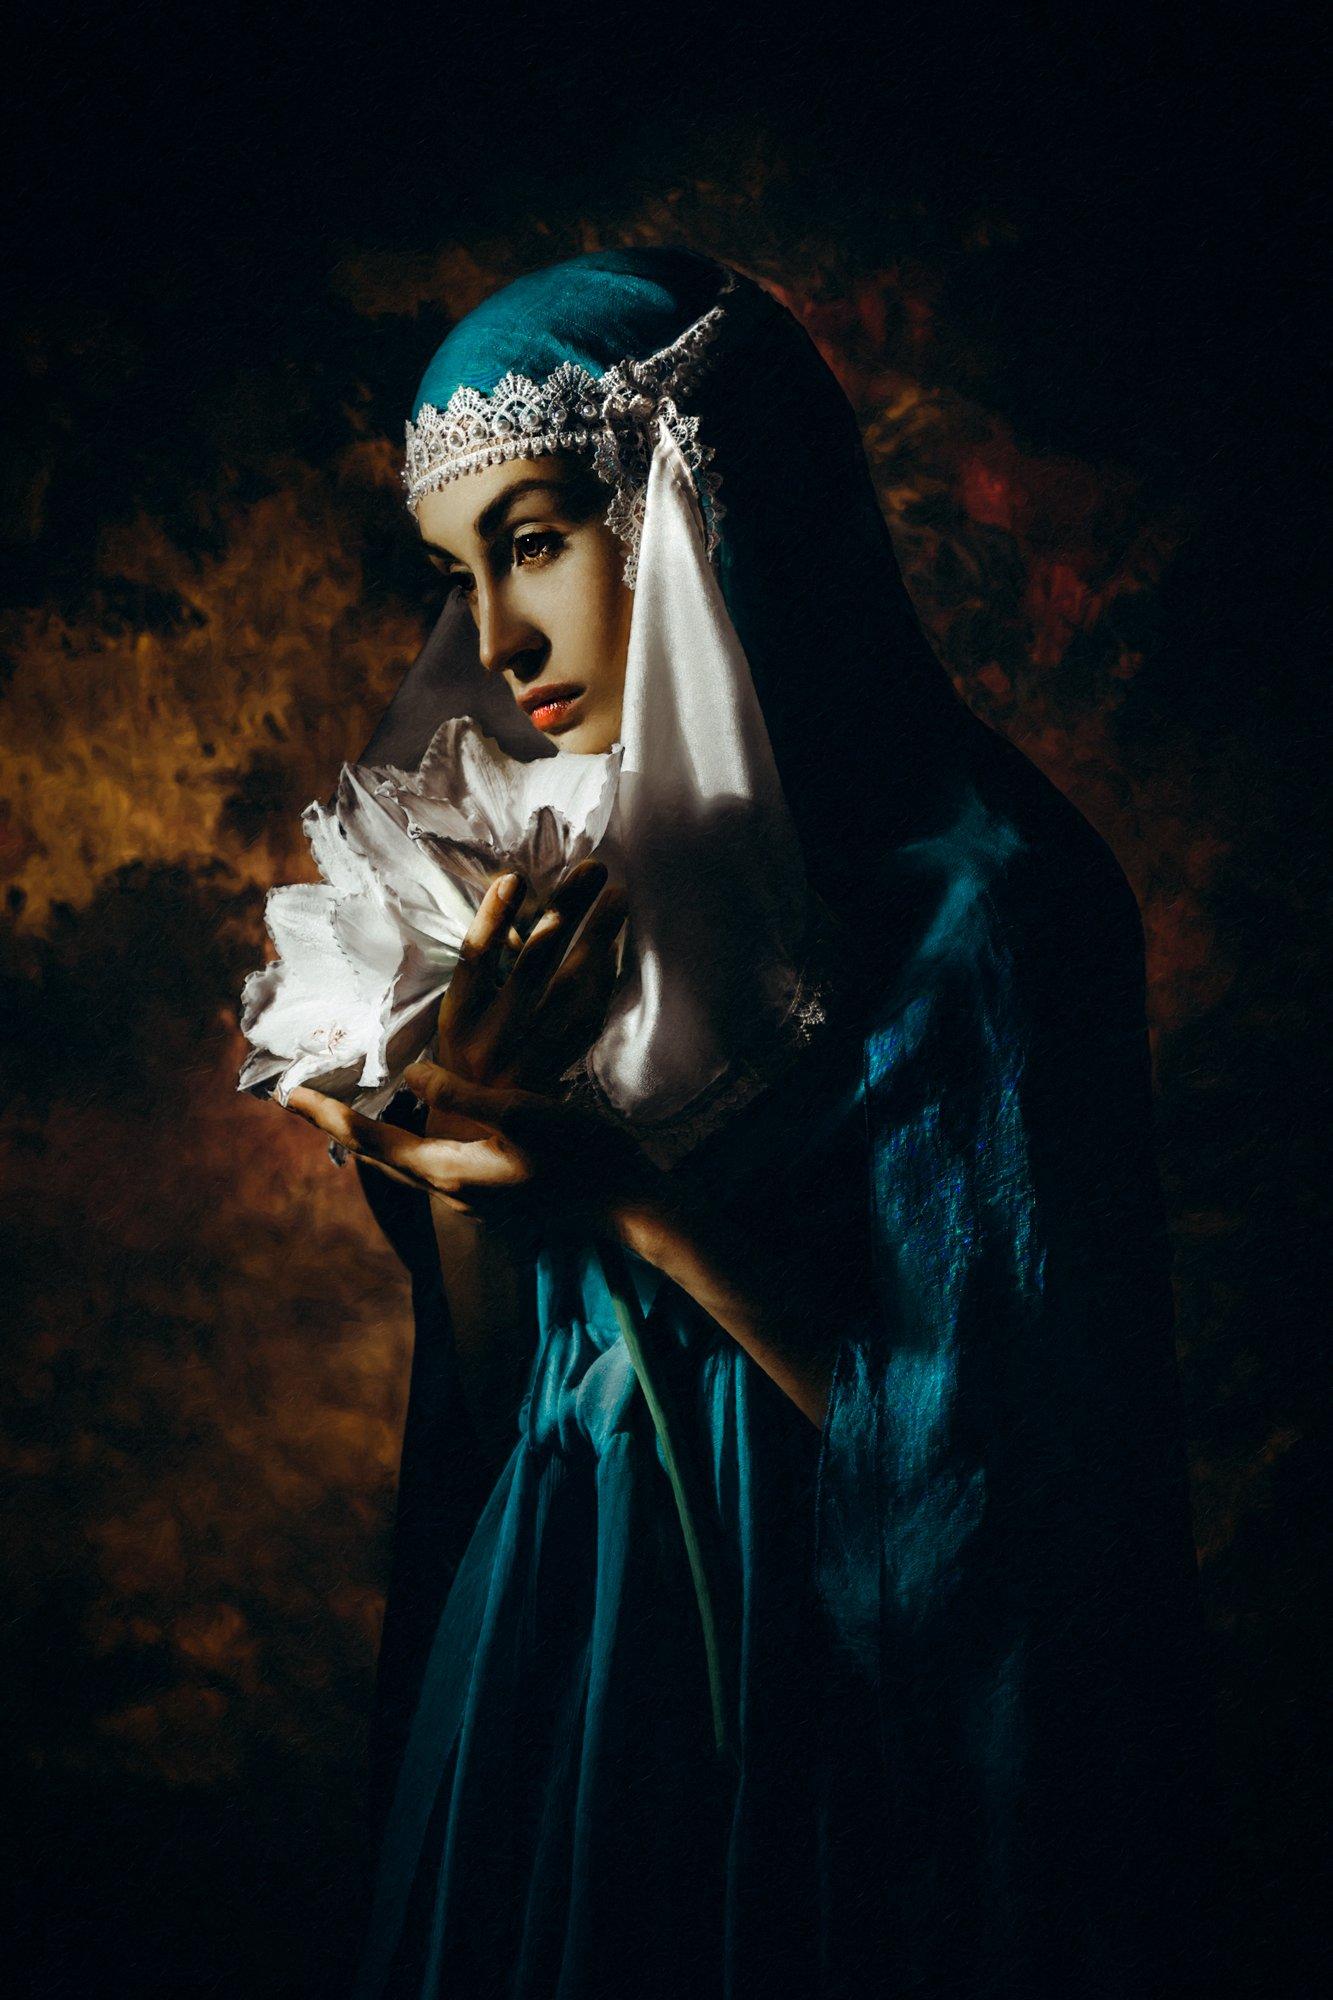 woman, beauty, portrait, art, studio, light, Руслан Болгов (Axe)